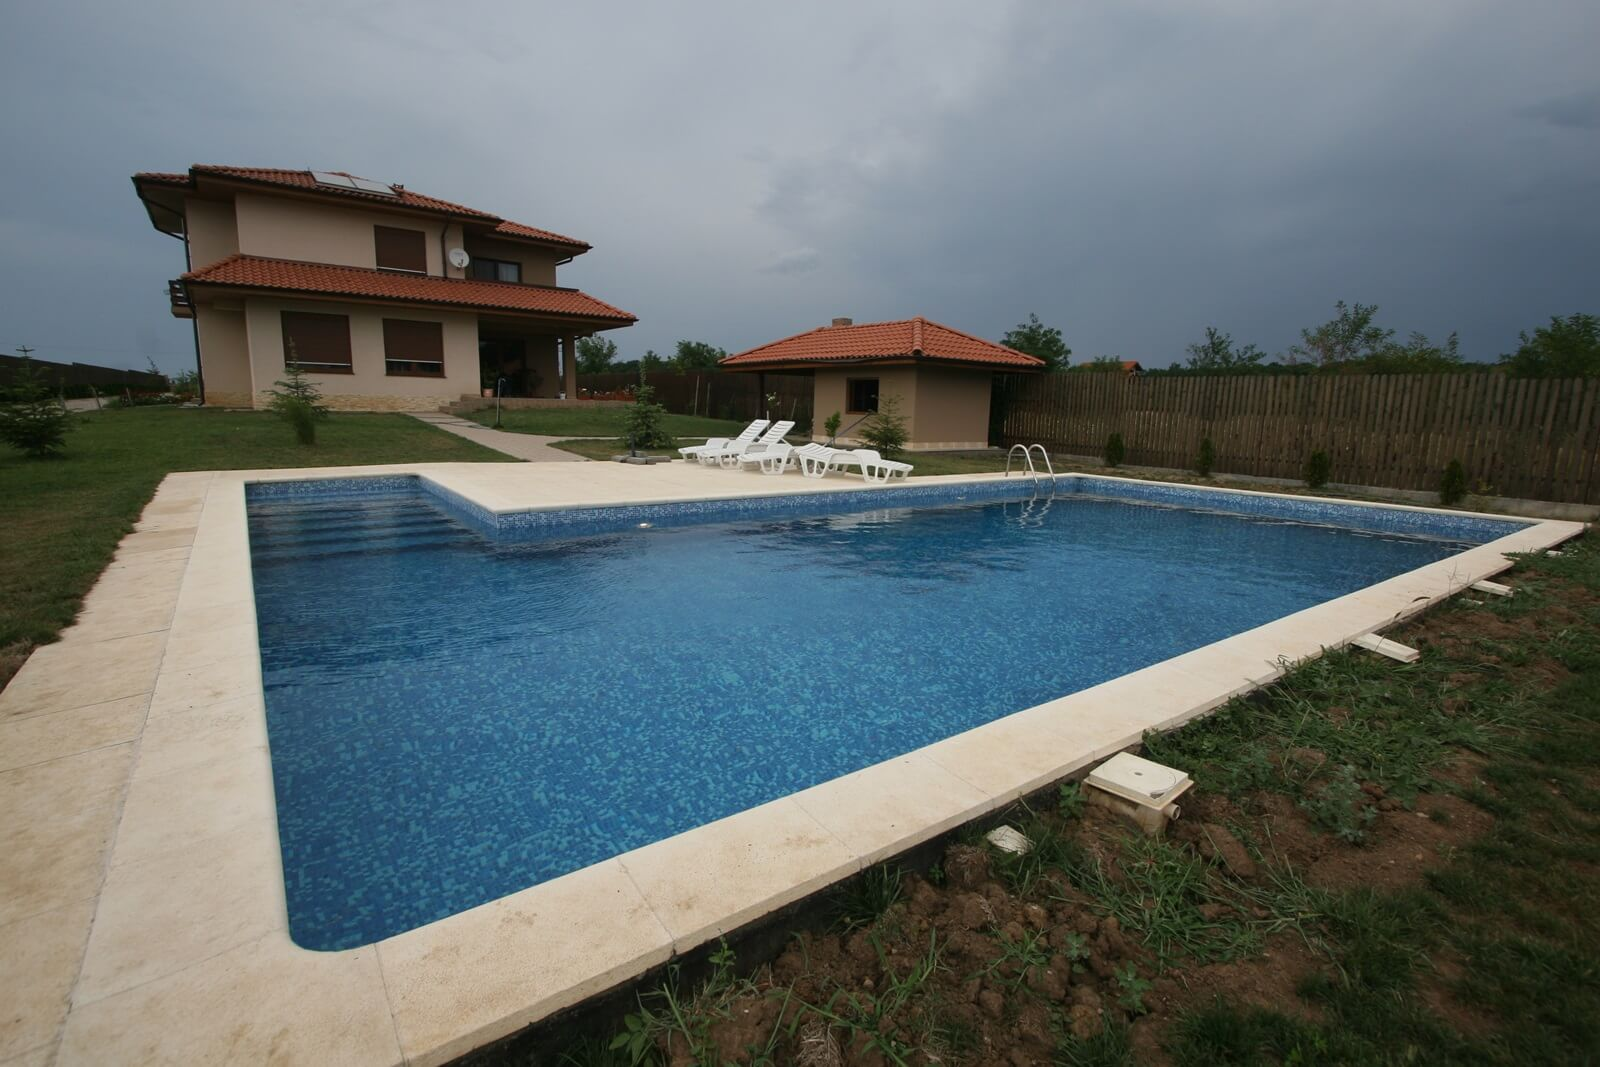 Piscina din beton cu skimmer cu vitroceramica piscine for Aqua 2000 piscine